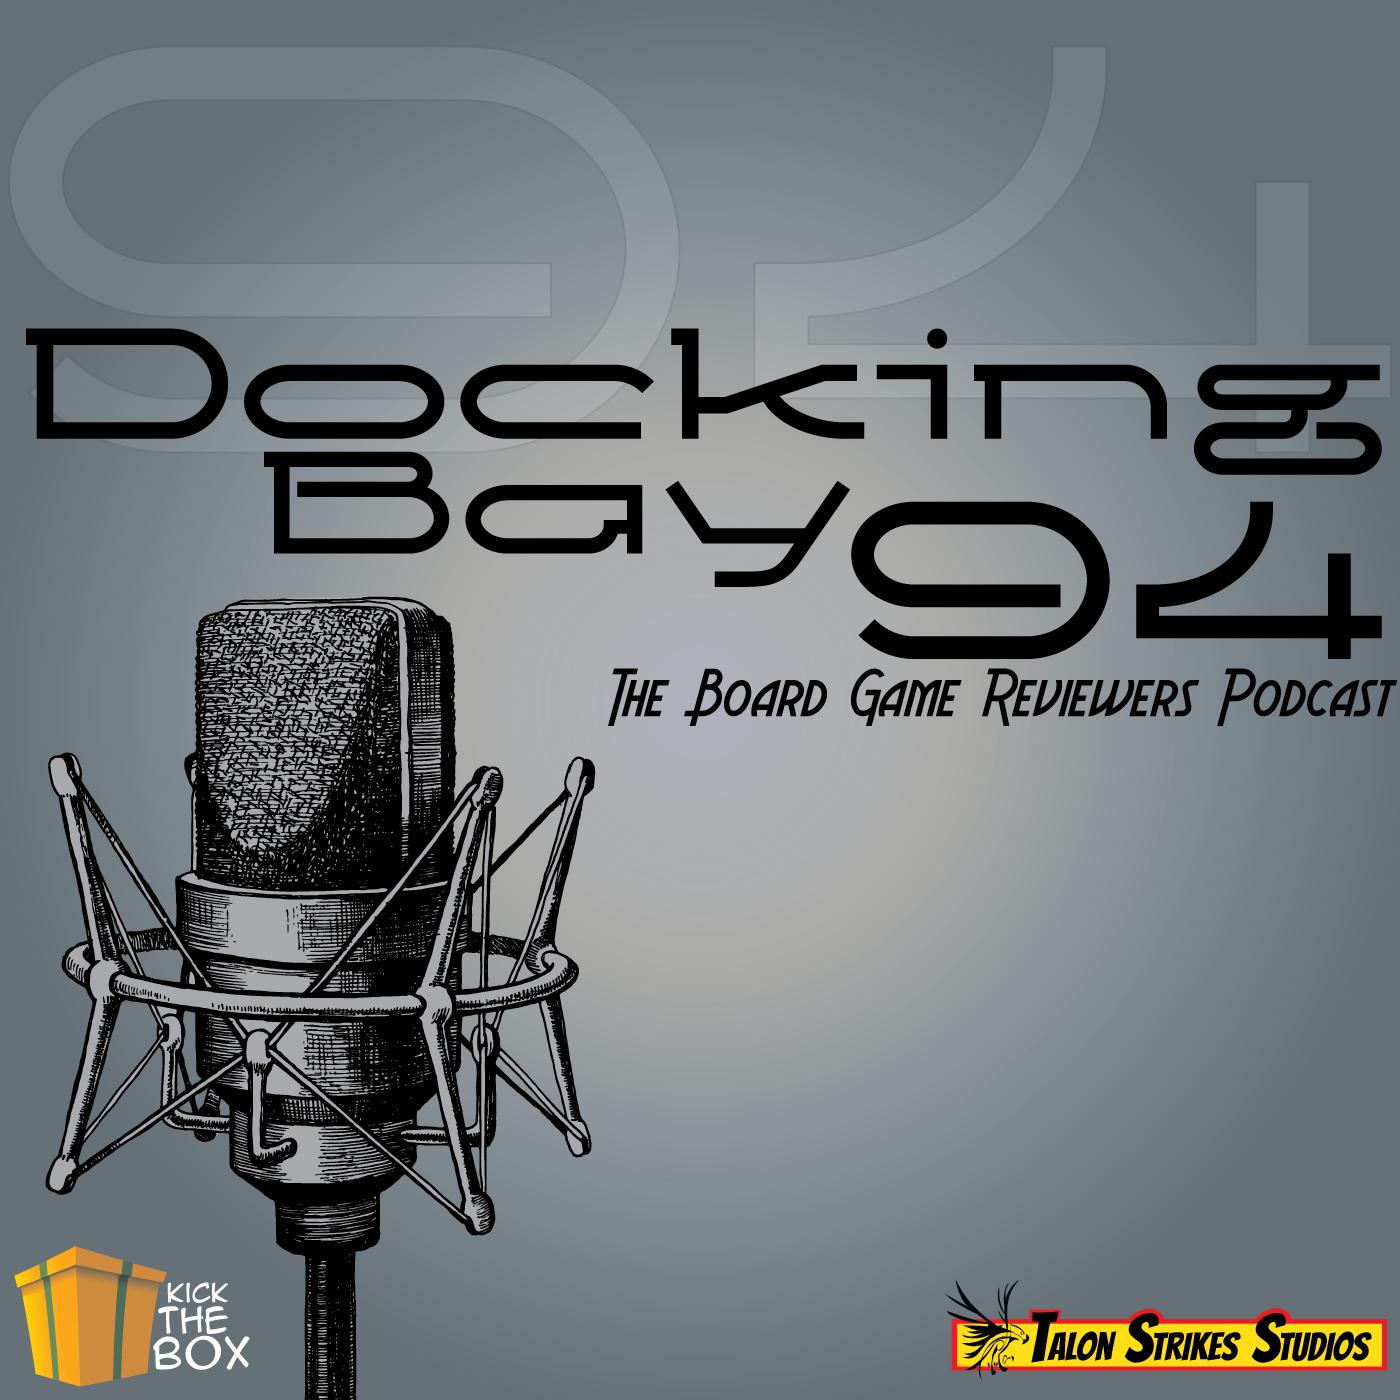 Docking Bay 94 - PodcastRating: PG